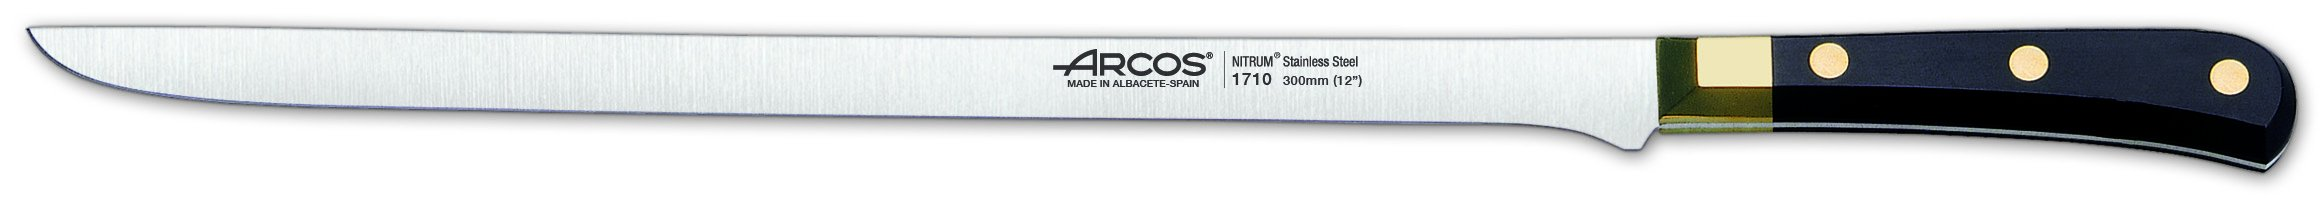 Arcos Regia 12-Inch Slicing Spanish Flexible Ham Knife